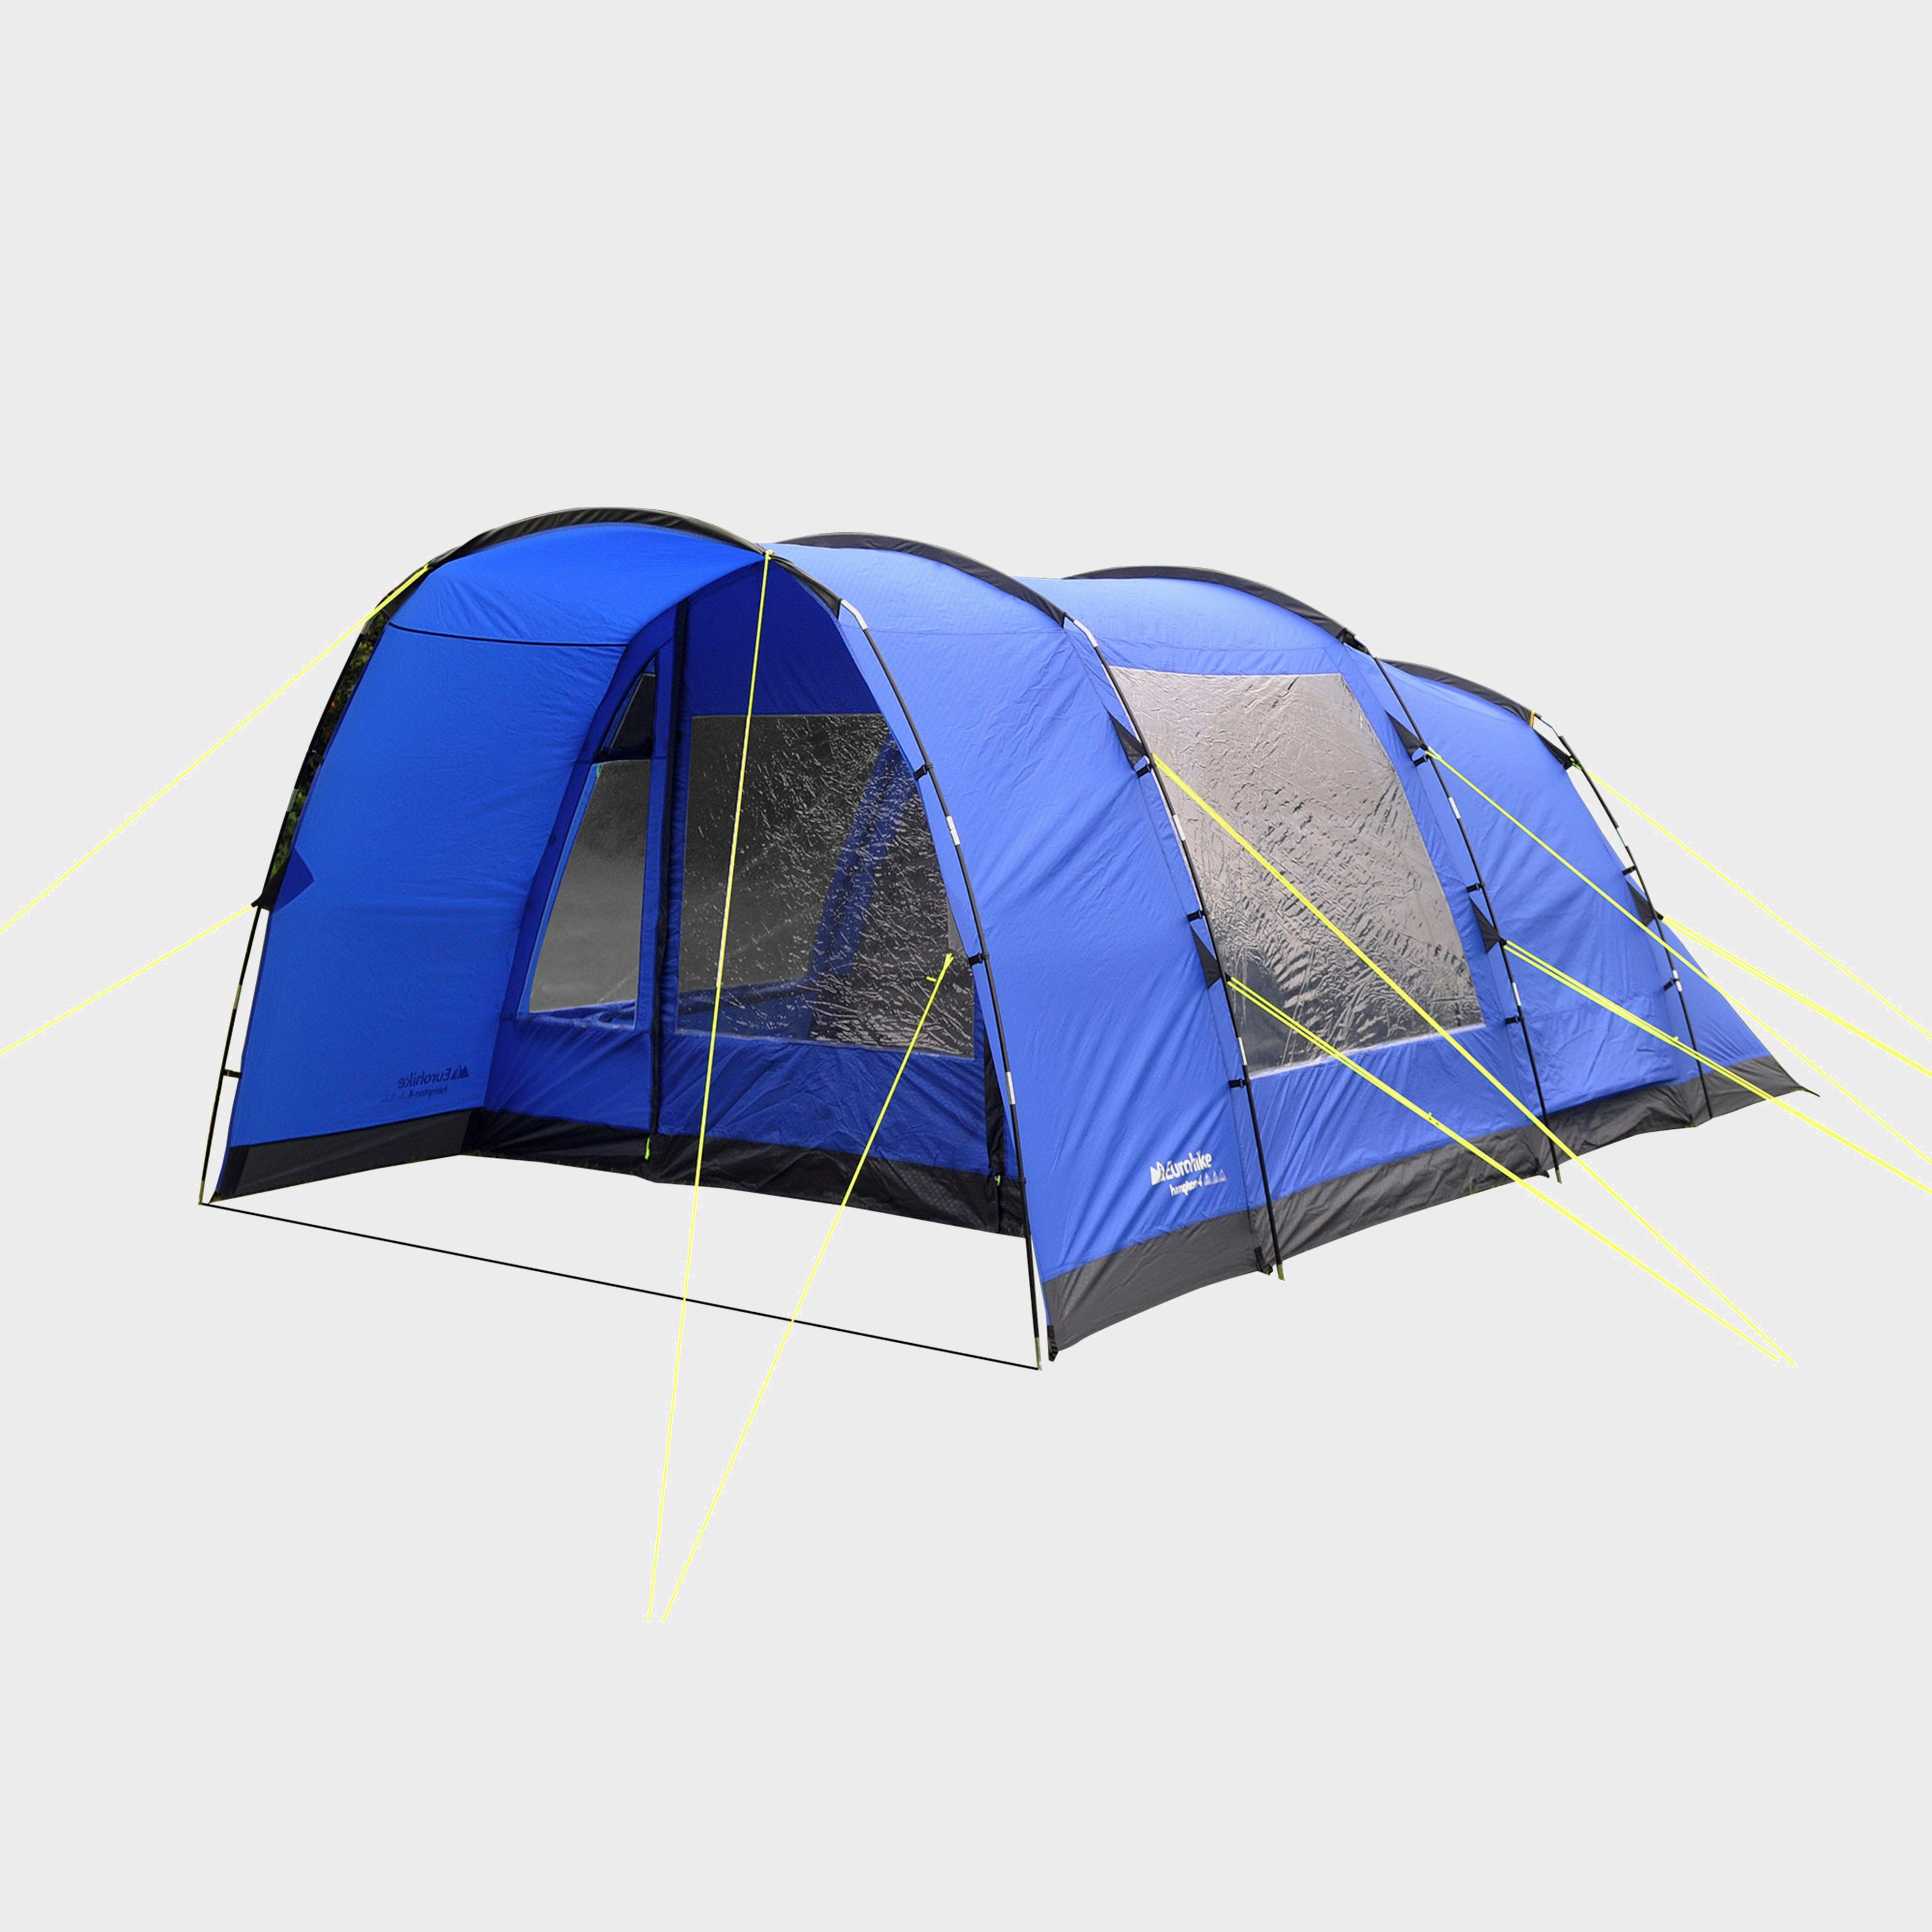 H&ton 4 Family Tent & Eurohike Hampton 4 Family Tent